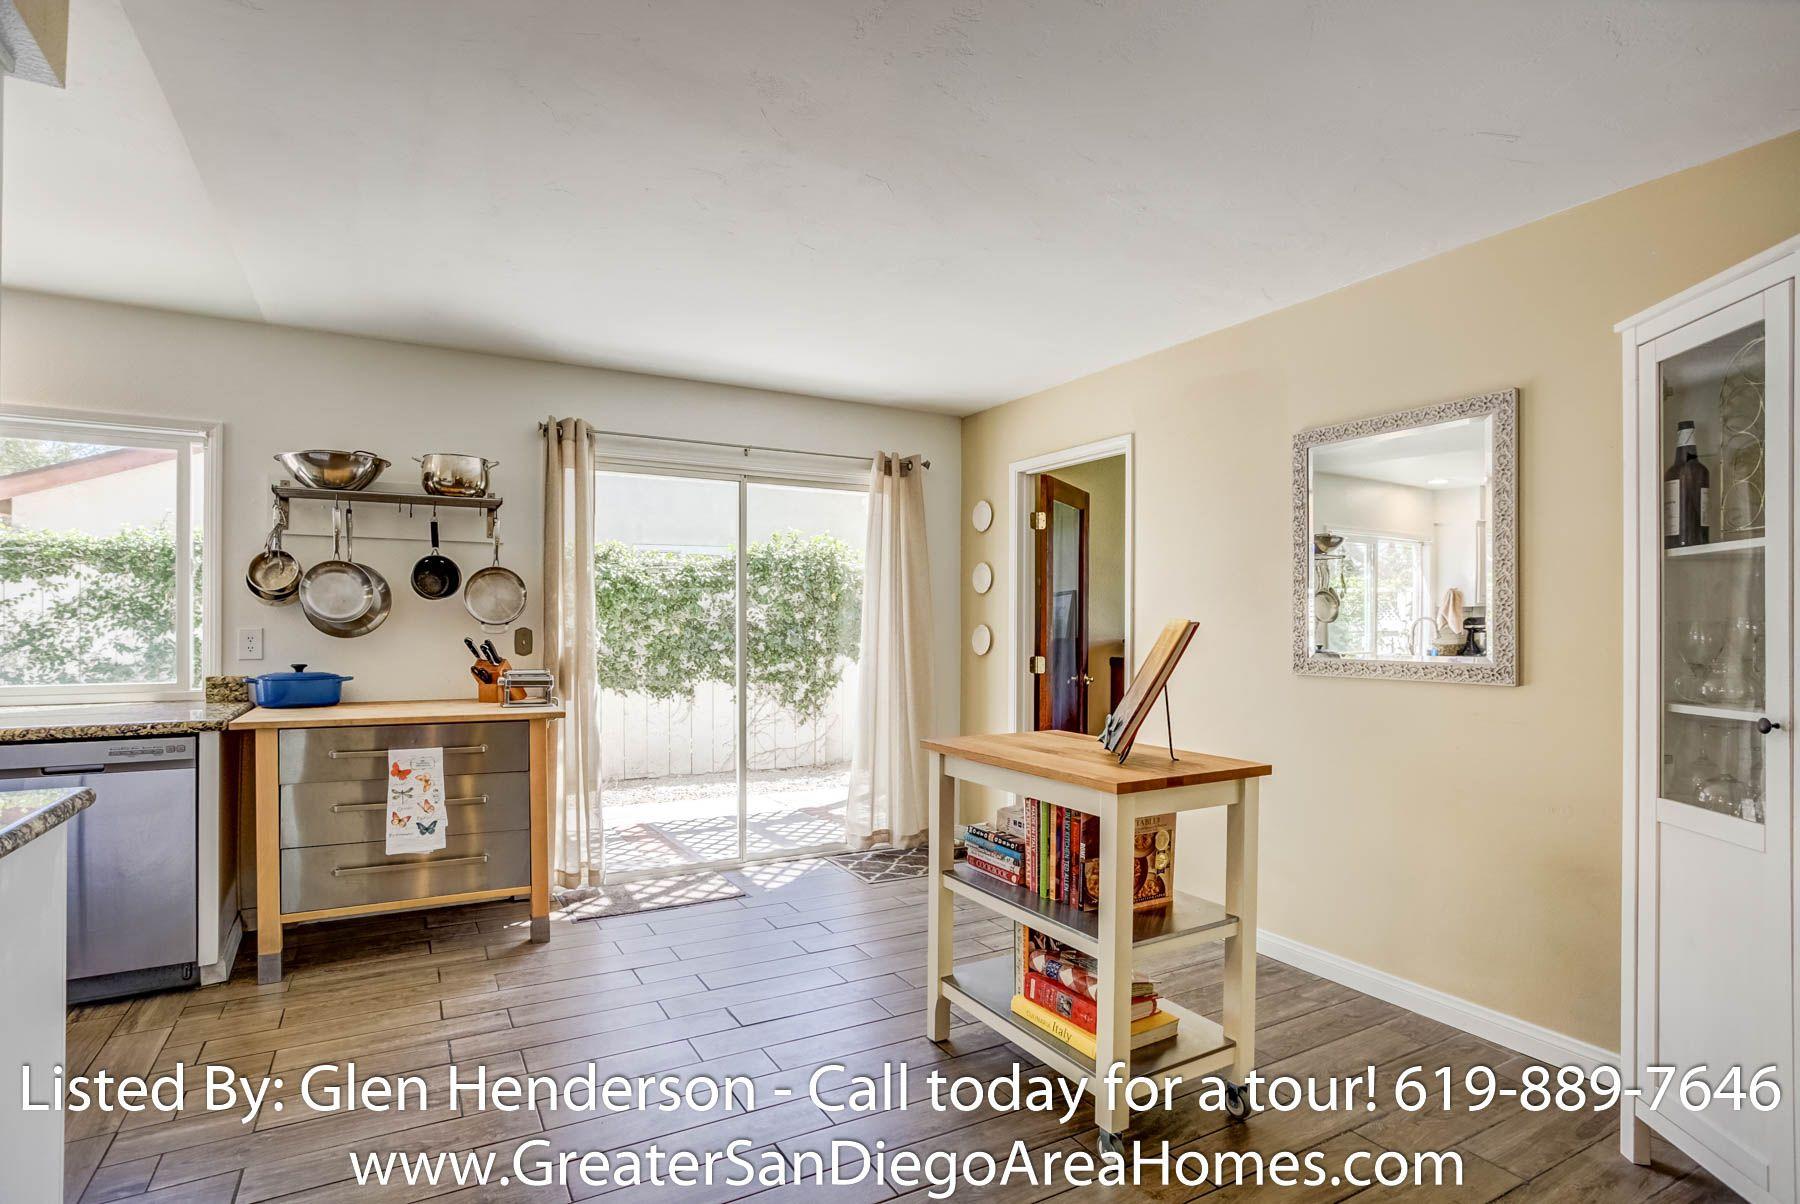 Tierrasanta Houses For Sale   4980 Paguera Court   Listed By Tierrasanta  Realtor Glen Henderson